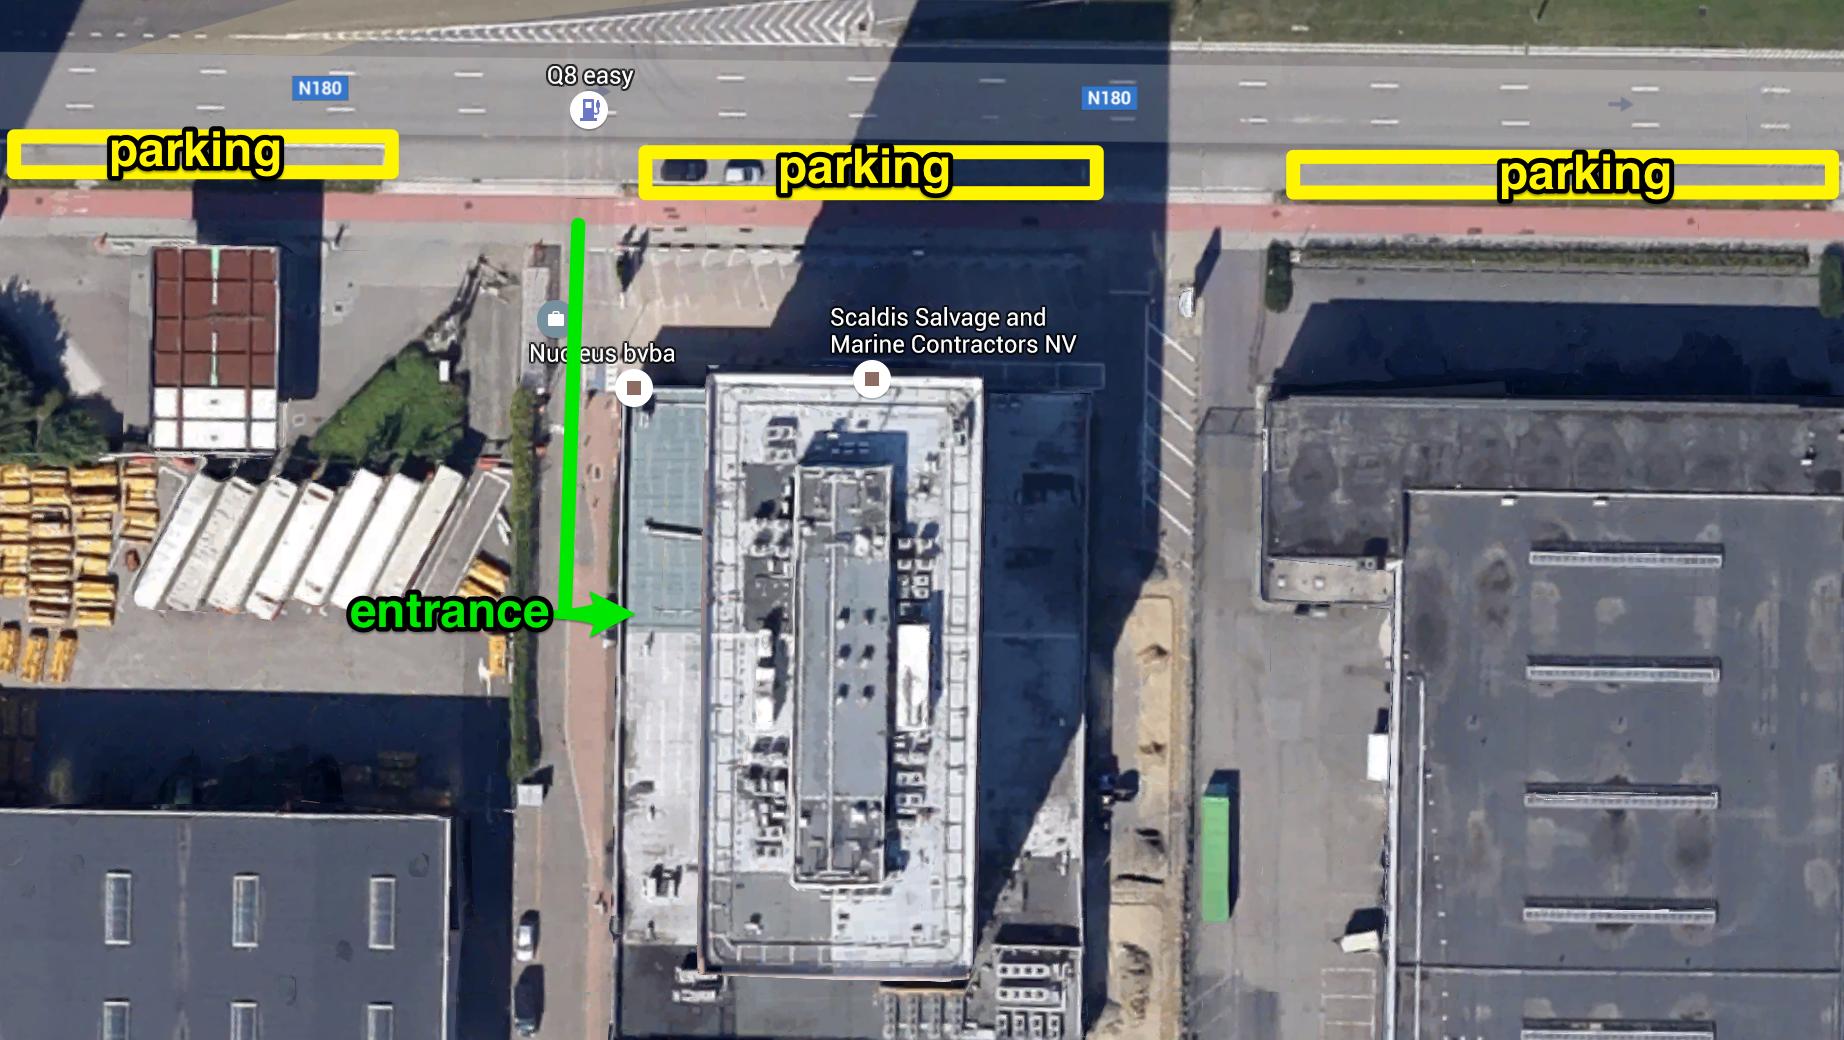 route parking